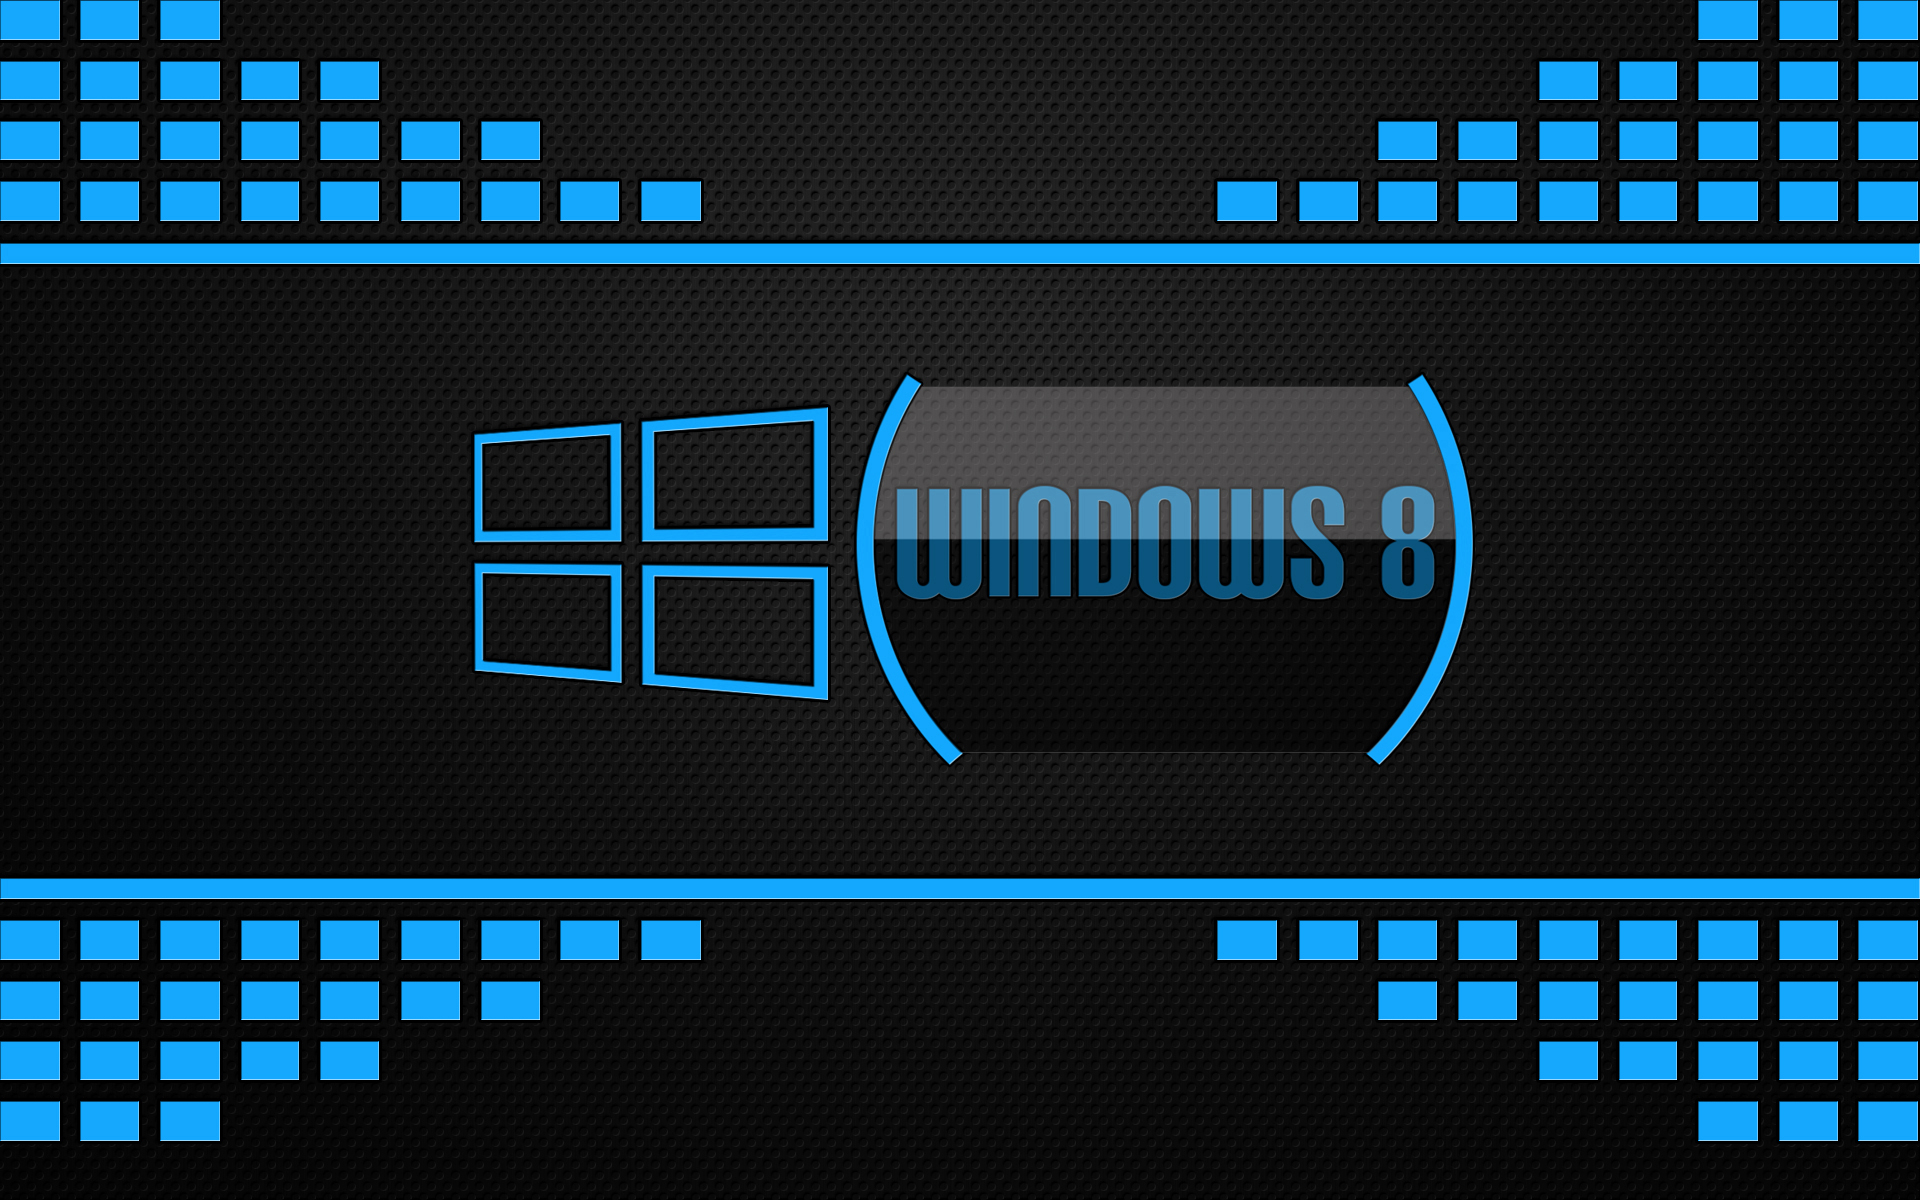 Windows 8 Blue by joancosi